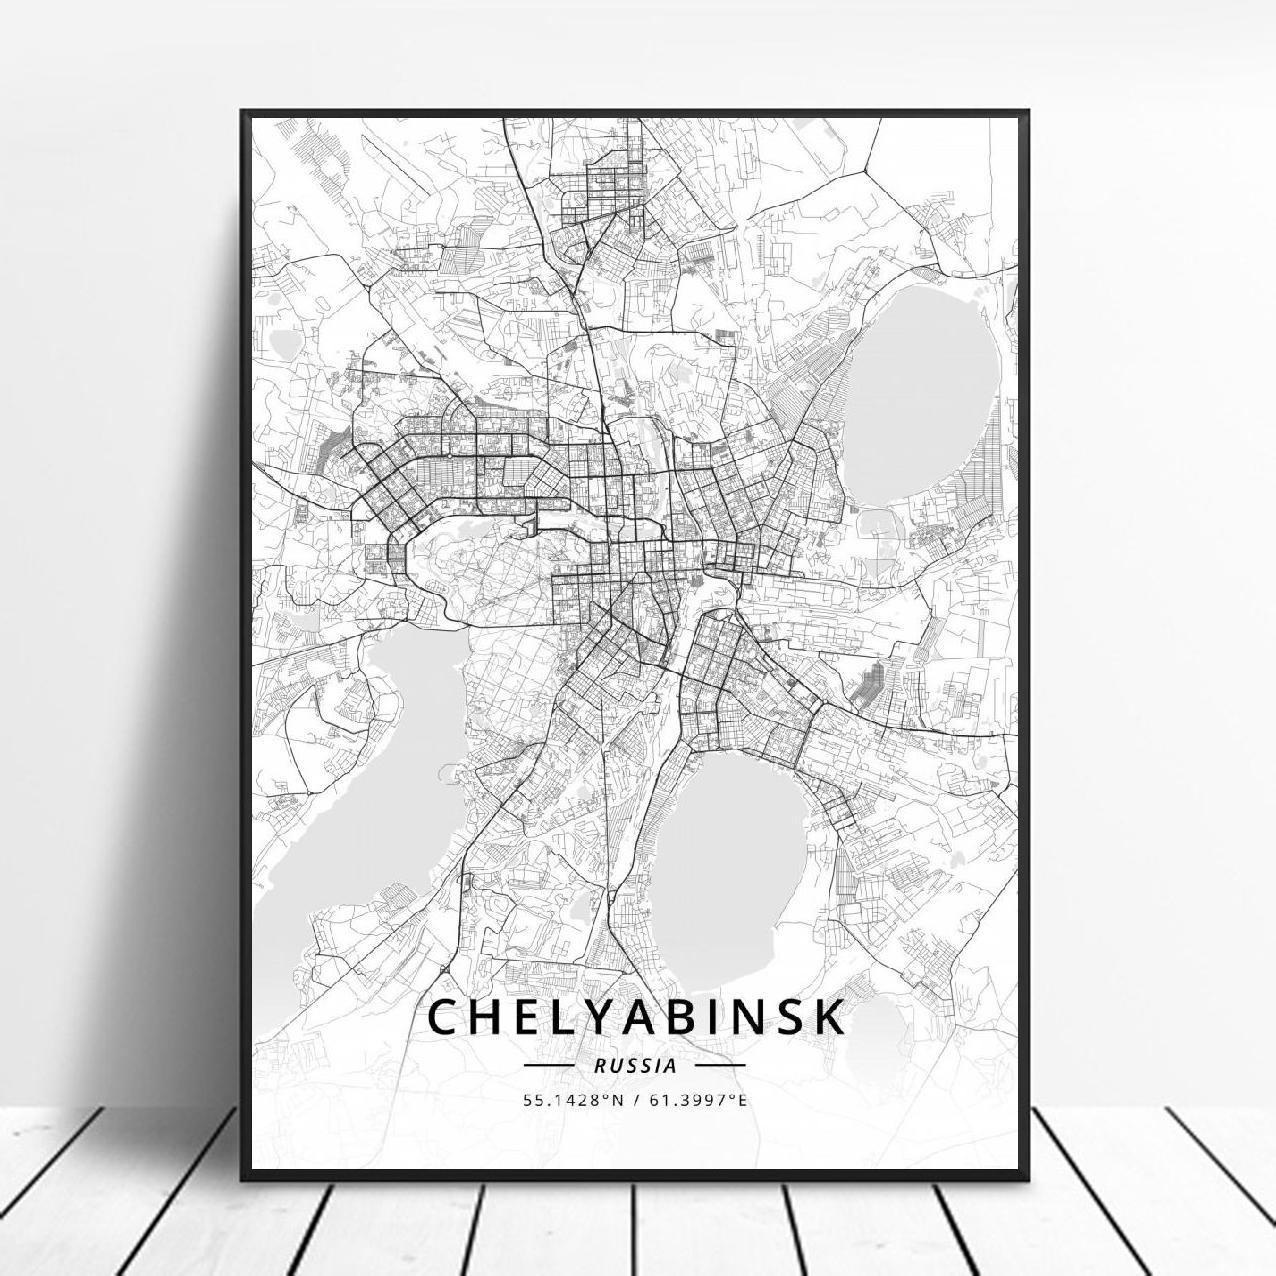 Chelyabinsk Moscú Novosibirsk Krasnoyarsk NIzhny Novgorod Kazan Rusia arte de la lona mapa